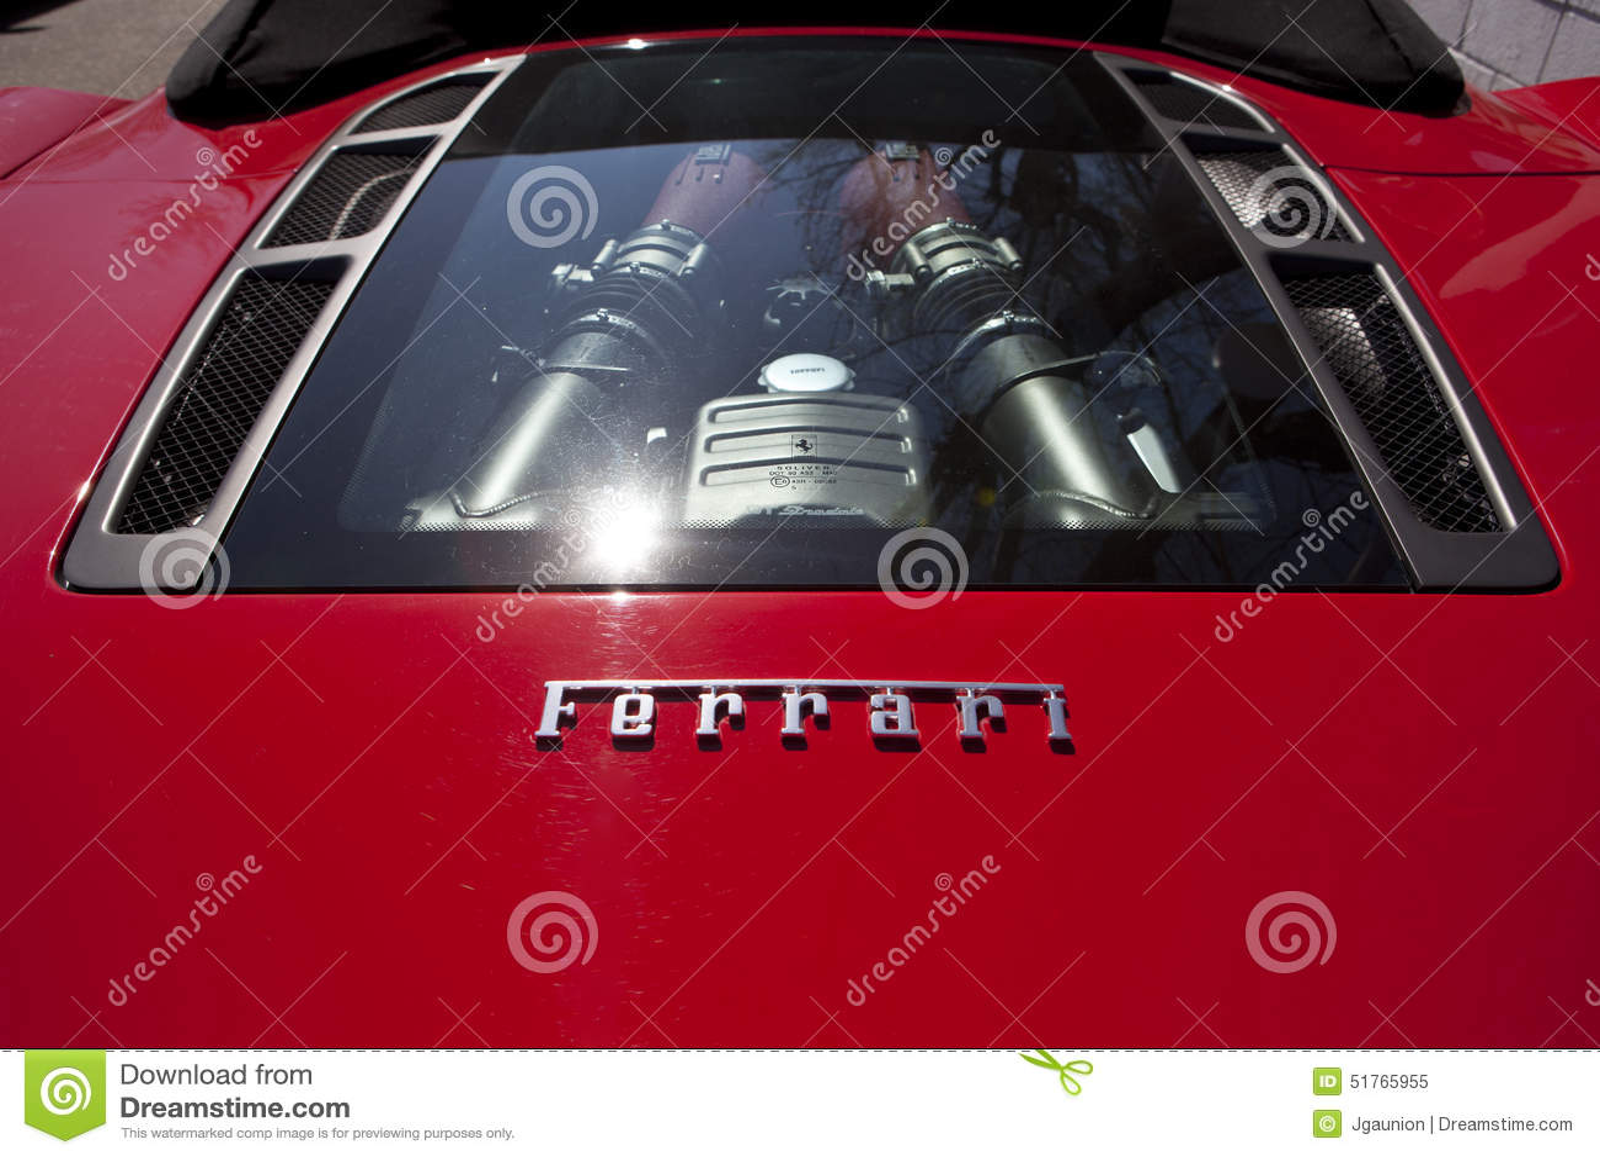 Ferrari back engine window editorial image. Image of race